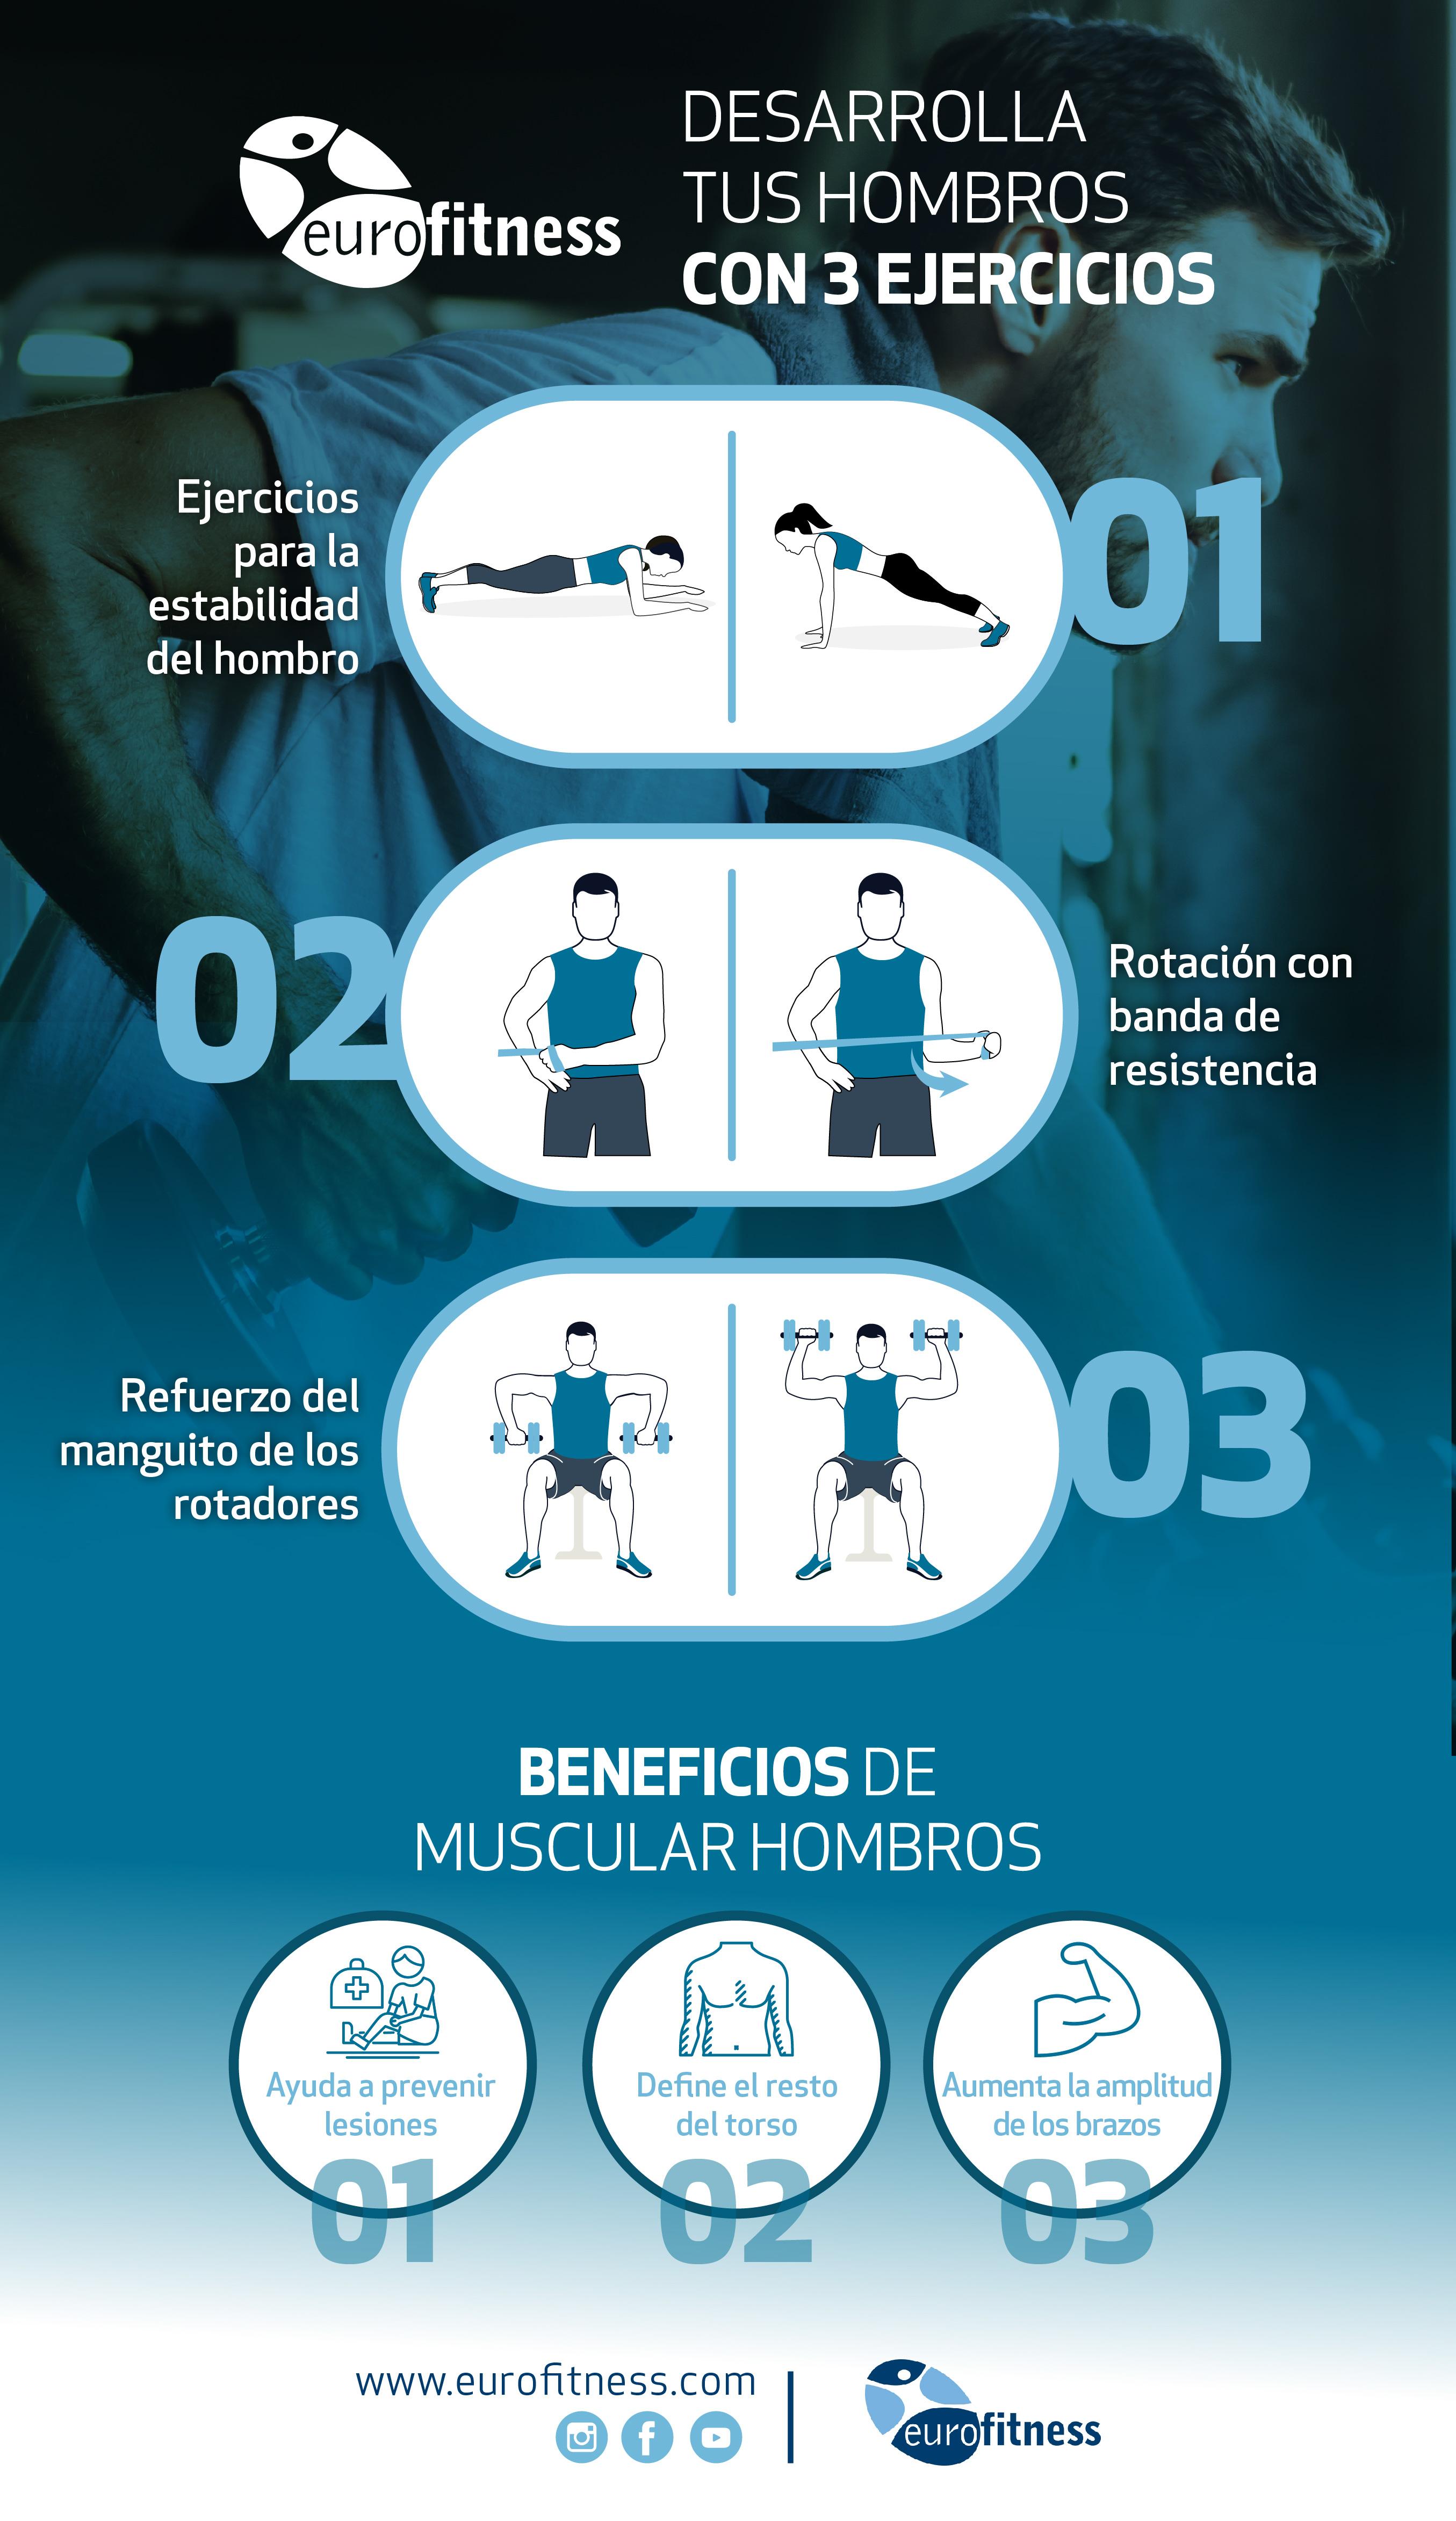 ejercicios para muscular hombros